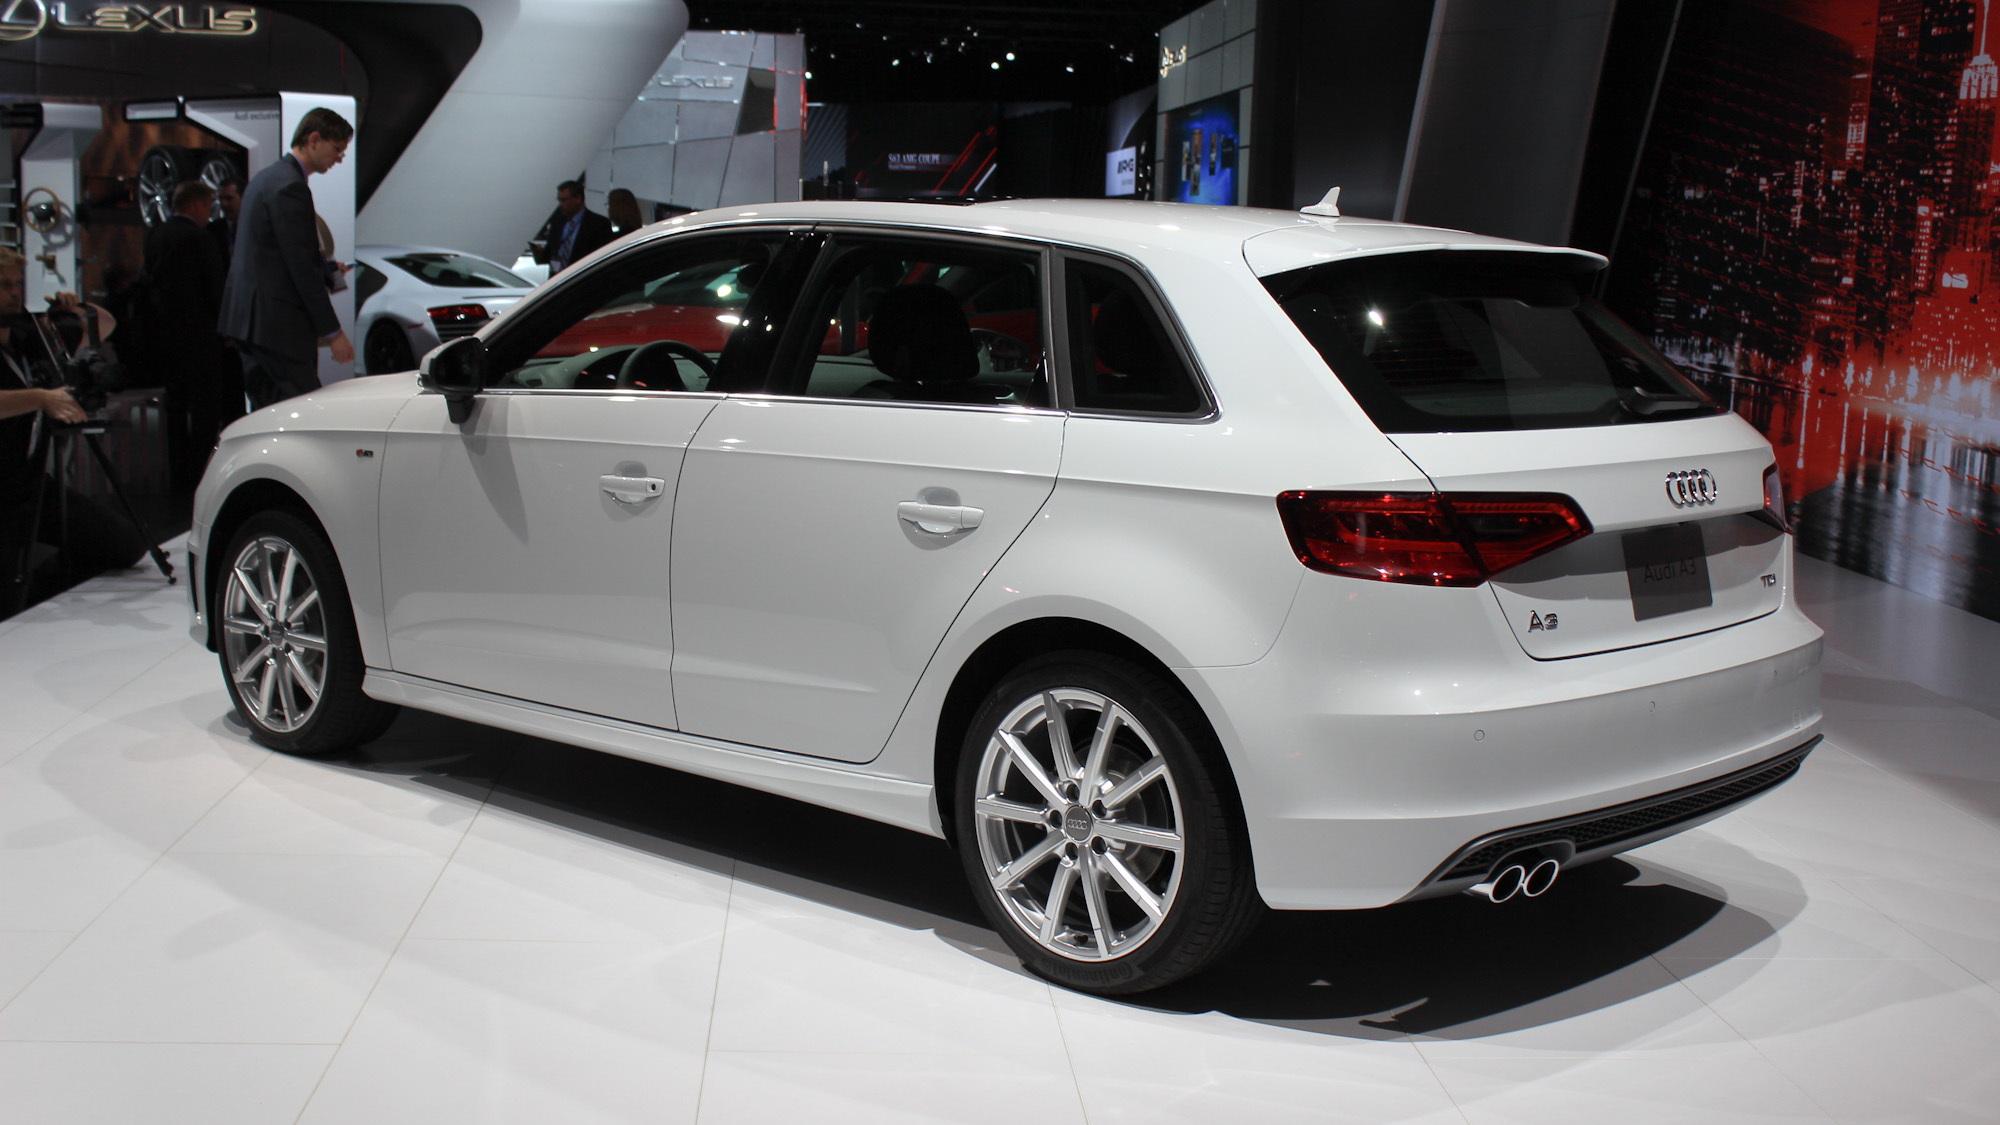 Audi A3 TDI Sportback, 2014 New York Auto Show